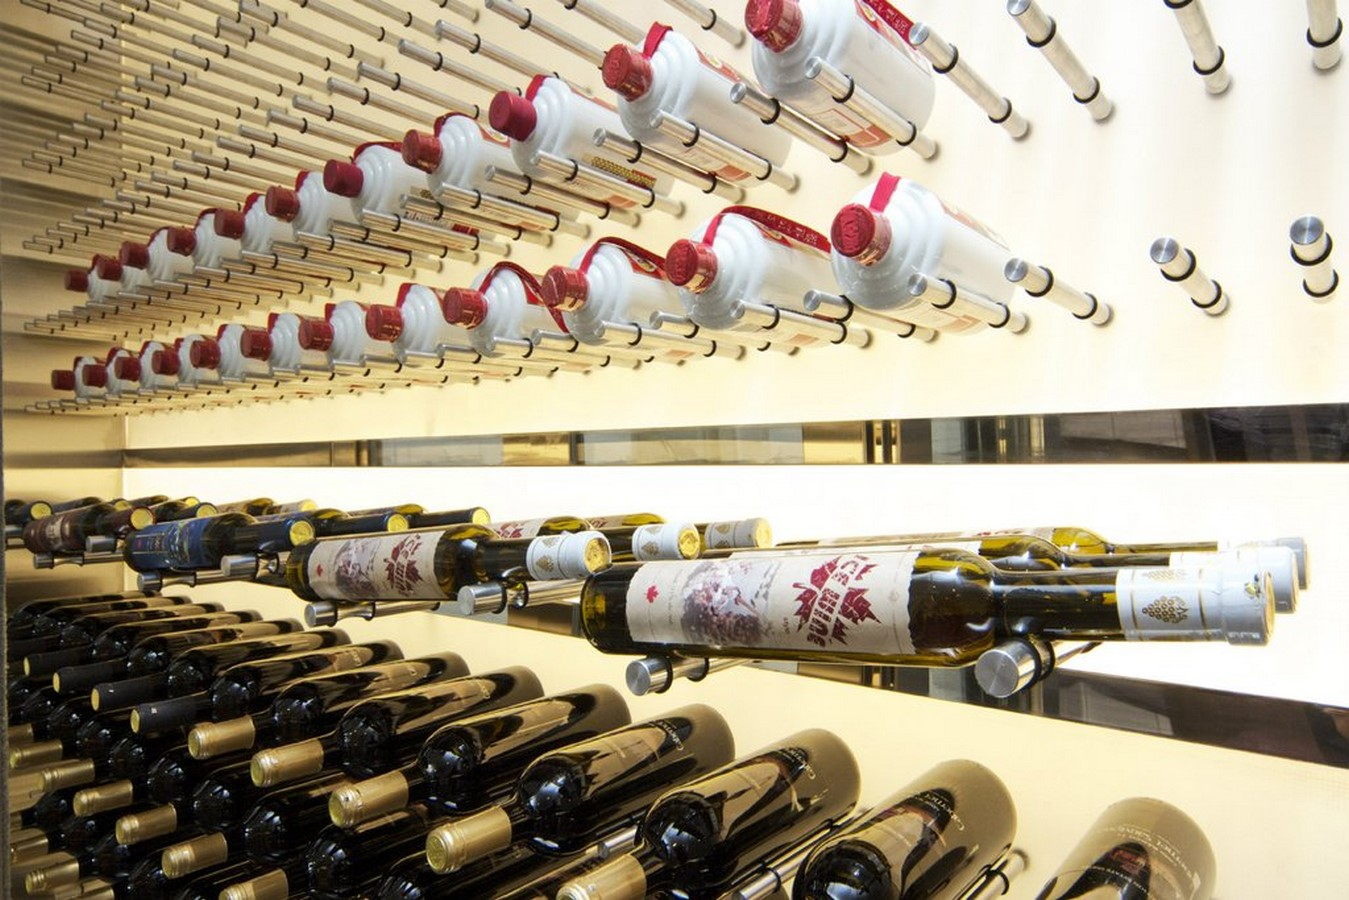 10 wine cellar design people should invest in - Sheet2